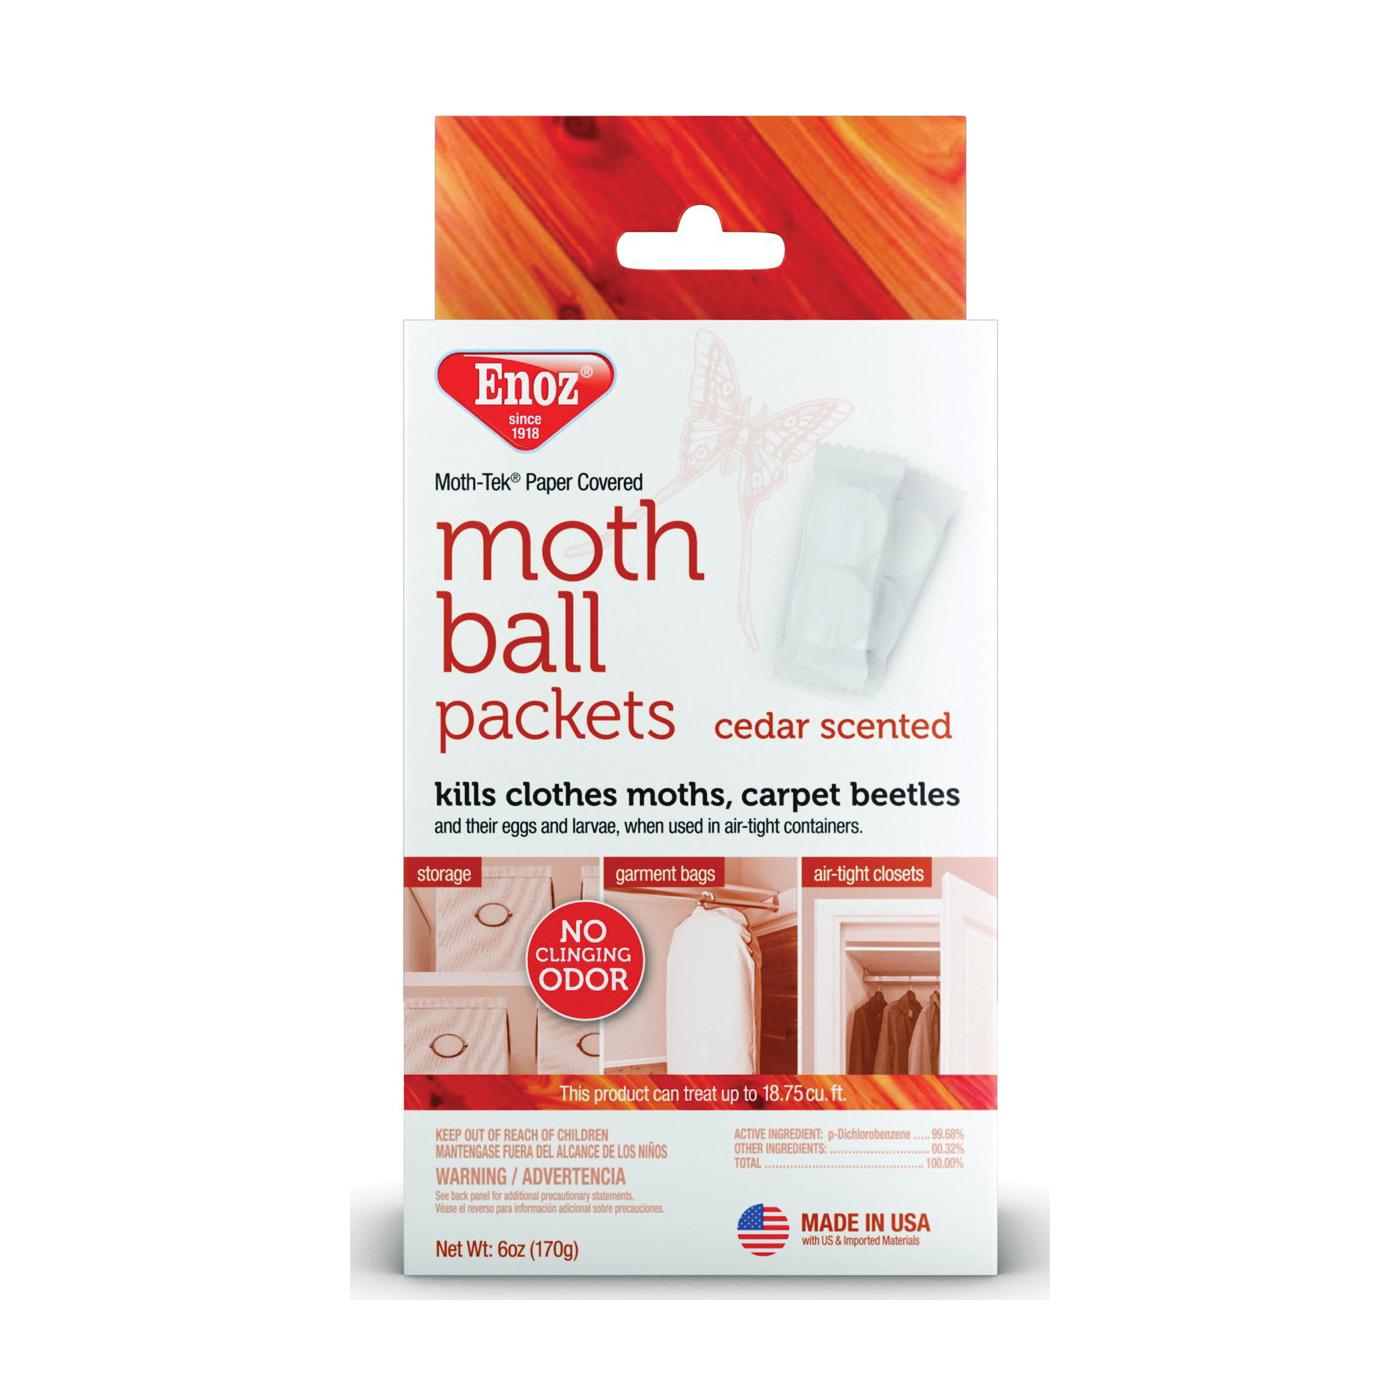 Picture of Enoz Moth-Tek E220.6T Moth Ball, Crystalline Solid, Cedar, White